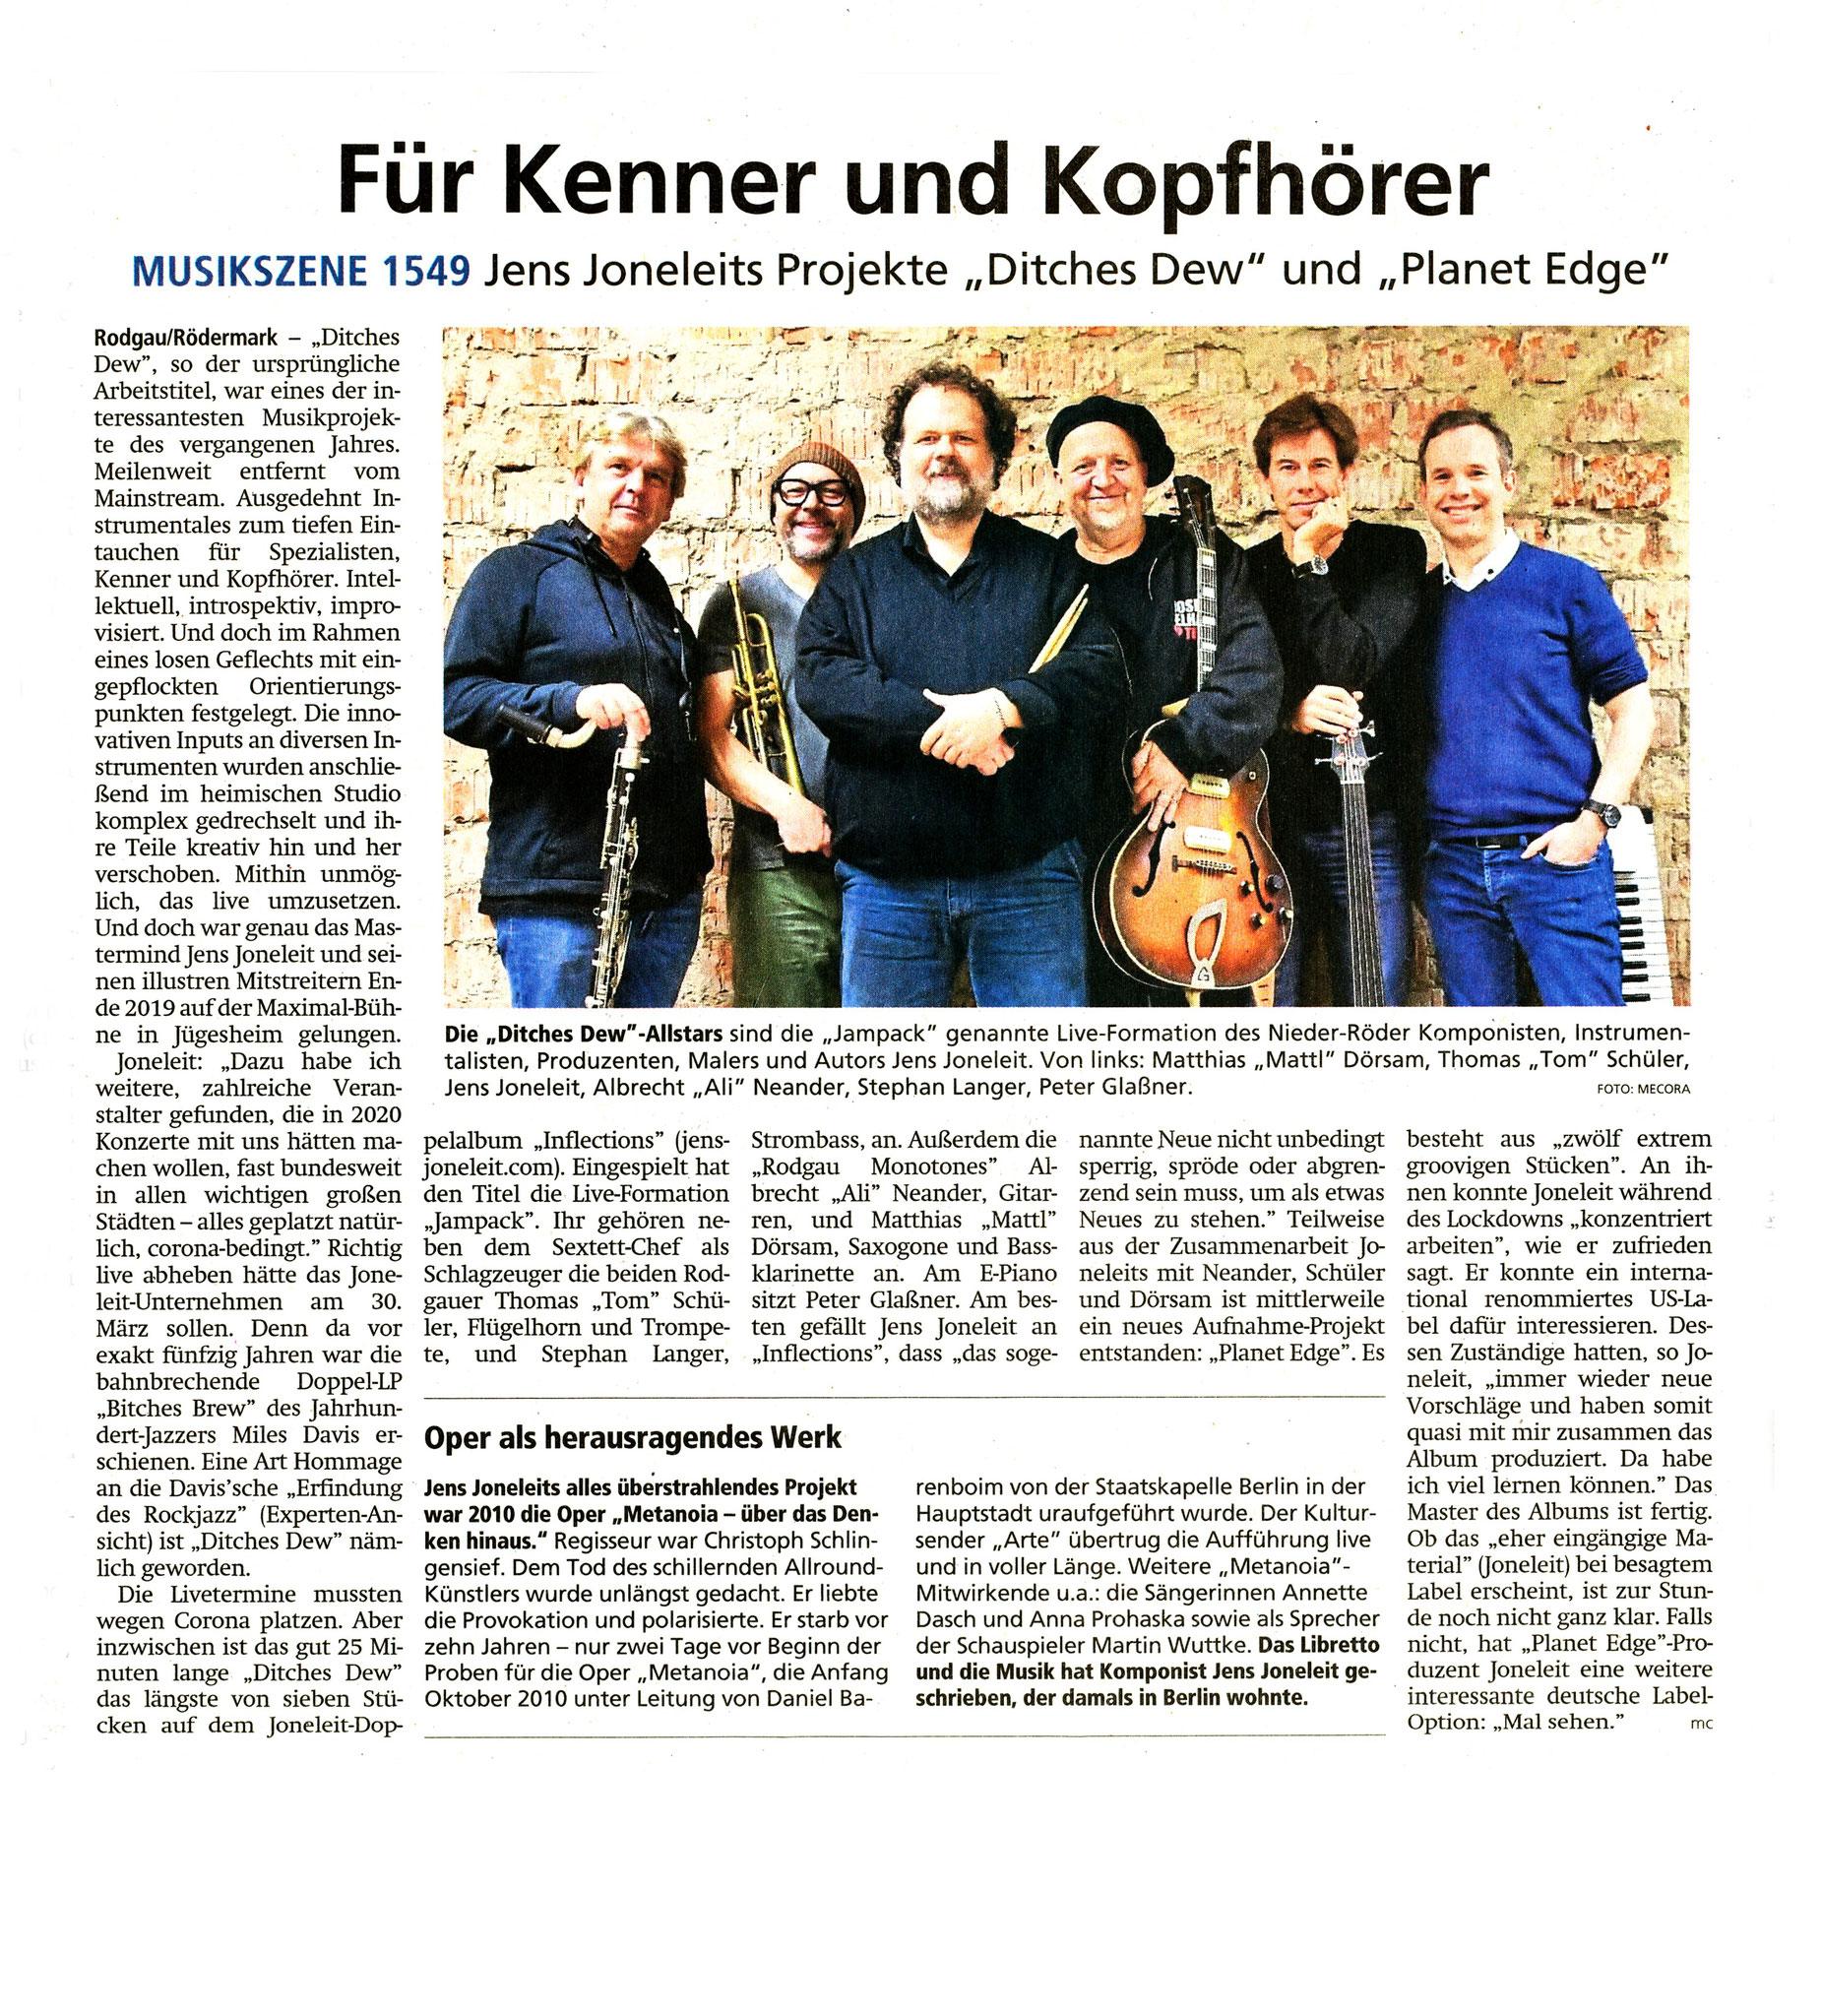 Offenbach Post, 8. Oktober 2020